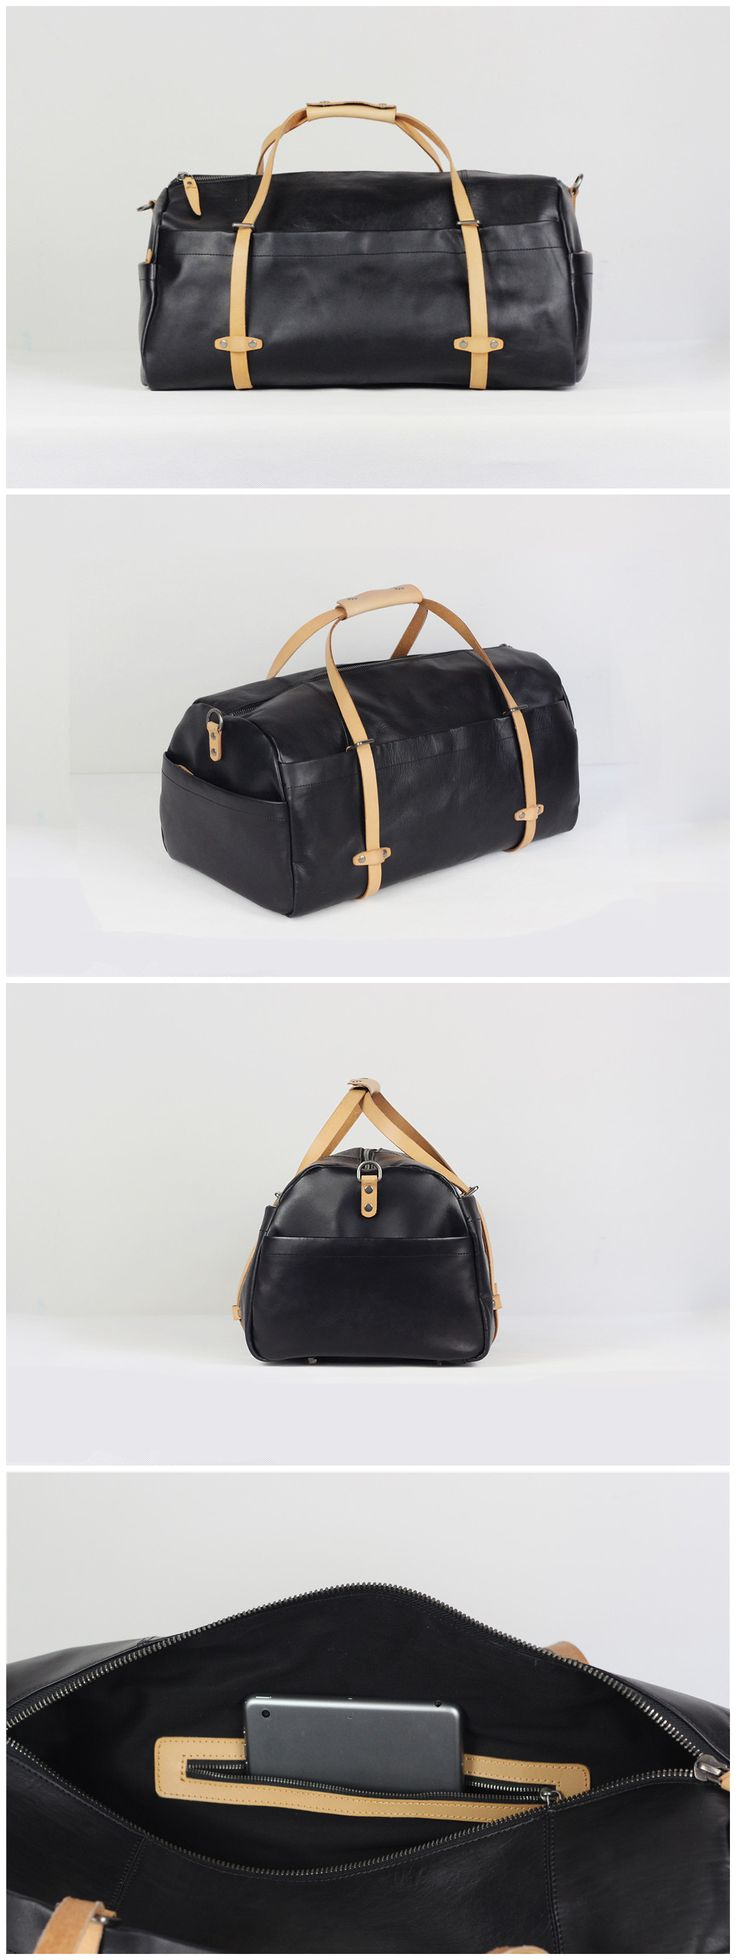 Handmade Full Grain Leather Holdall Luggage Bag Leather Travel Duffel Bag